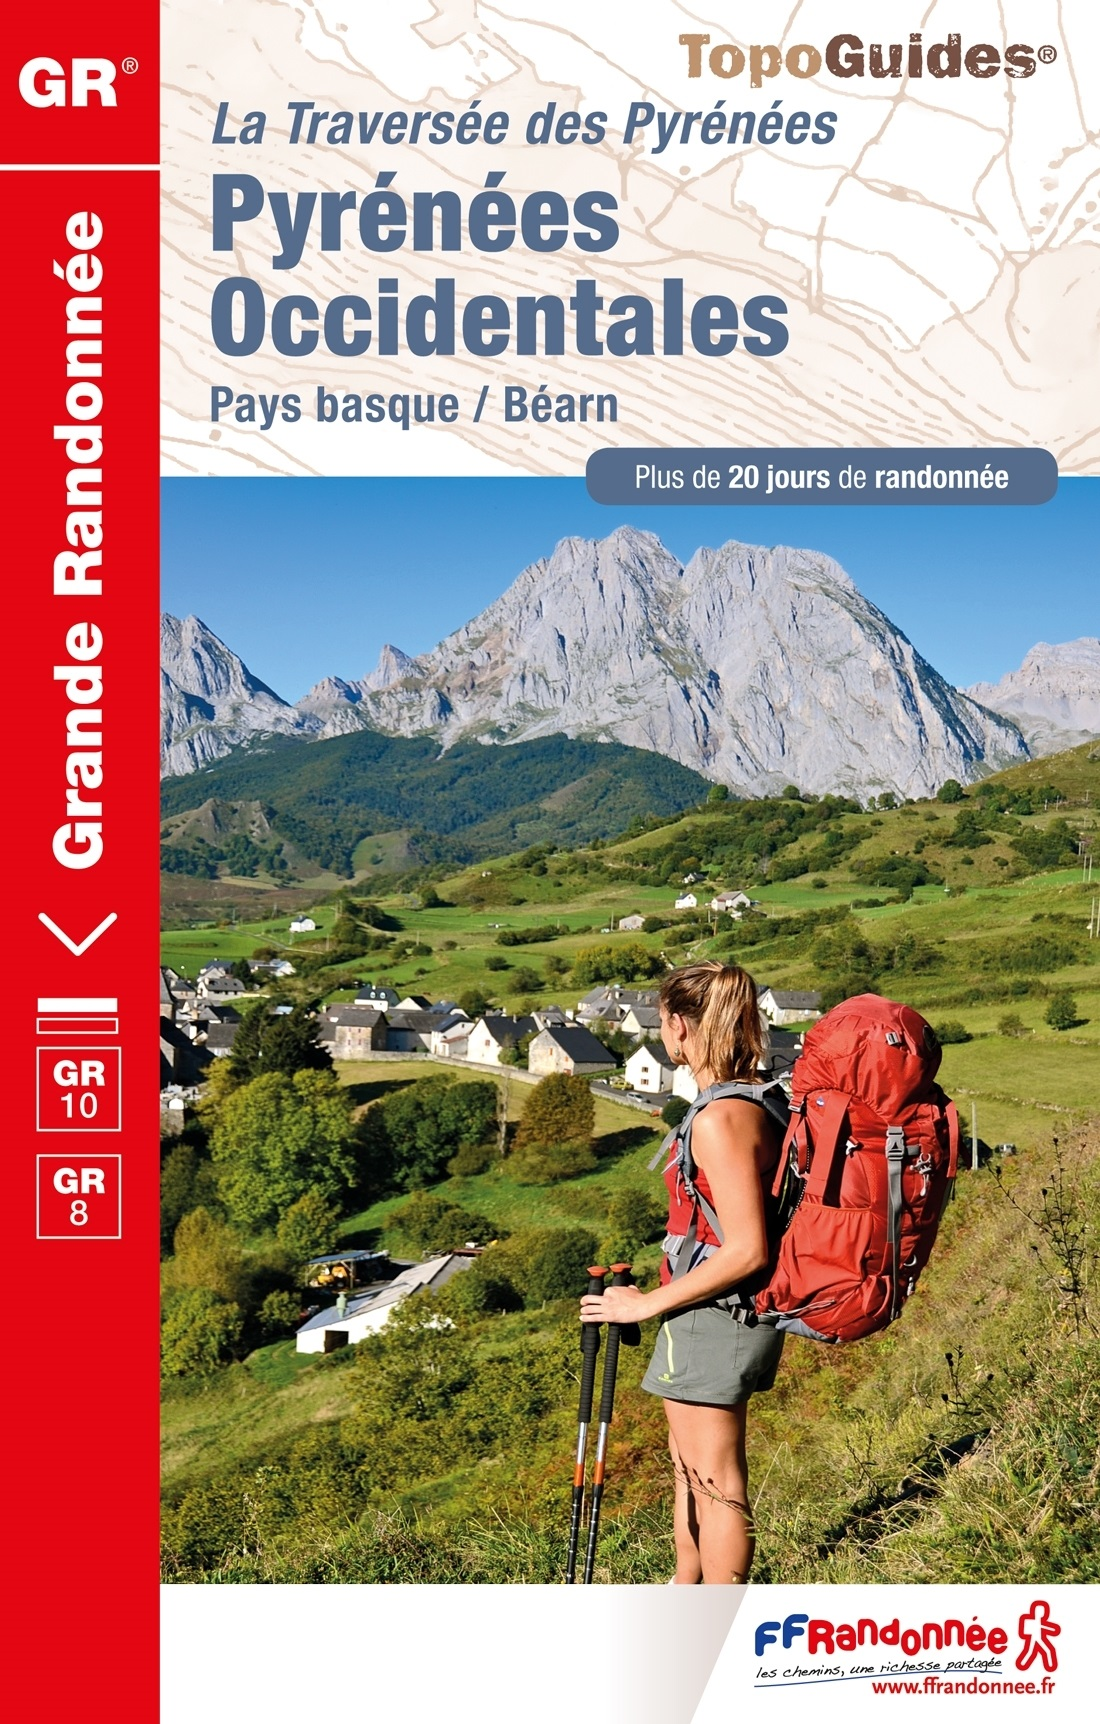 TG1086 Pyrénées Occidentales | wandelgids GR-10 9782751409844  FFRP Topoguides  Meerdaagse wandelroutes, Wandelgidsen Baskenland, Franse Pyreneeën, Toulouse, Gers, Garonne